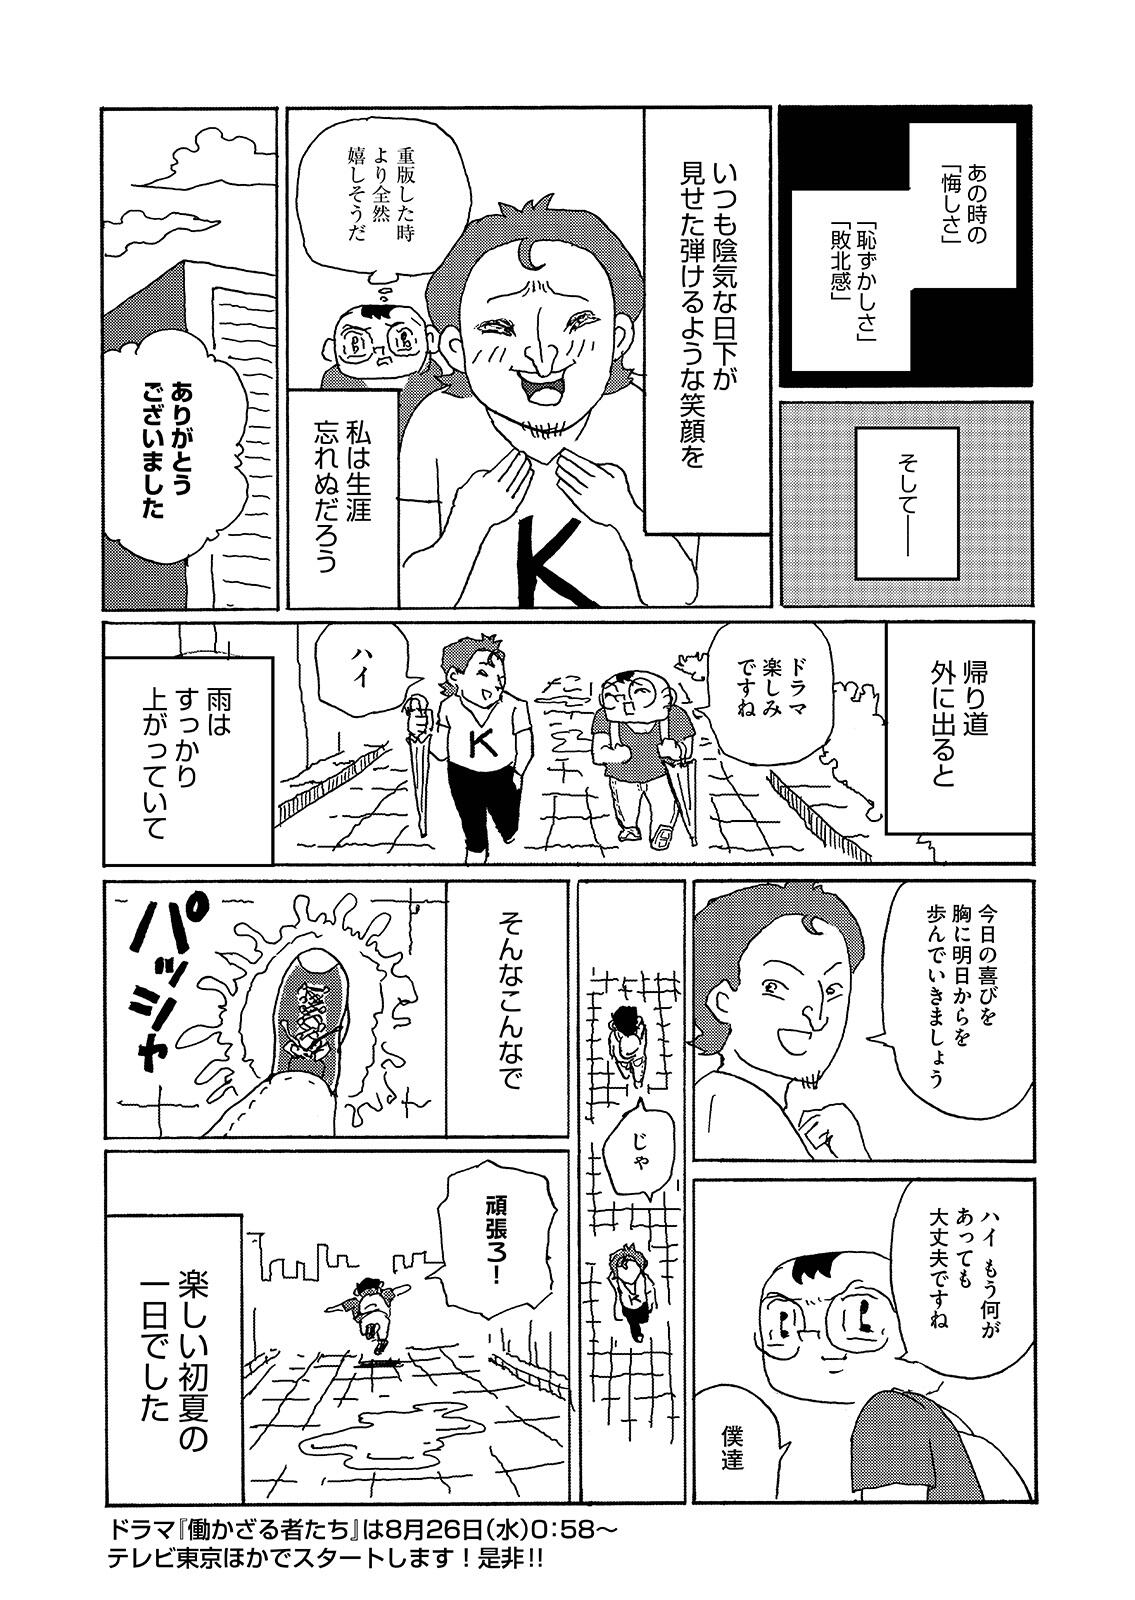 20200821_hatarakazaru_05.jpg